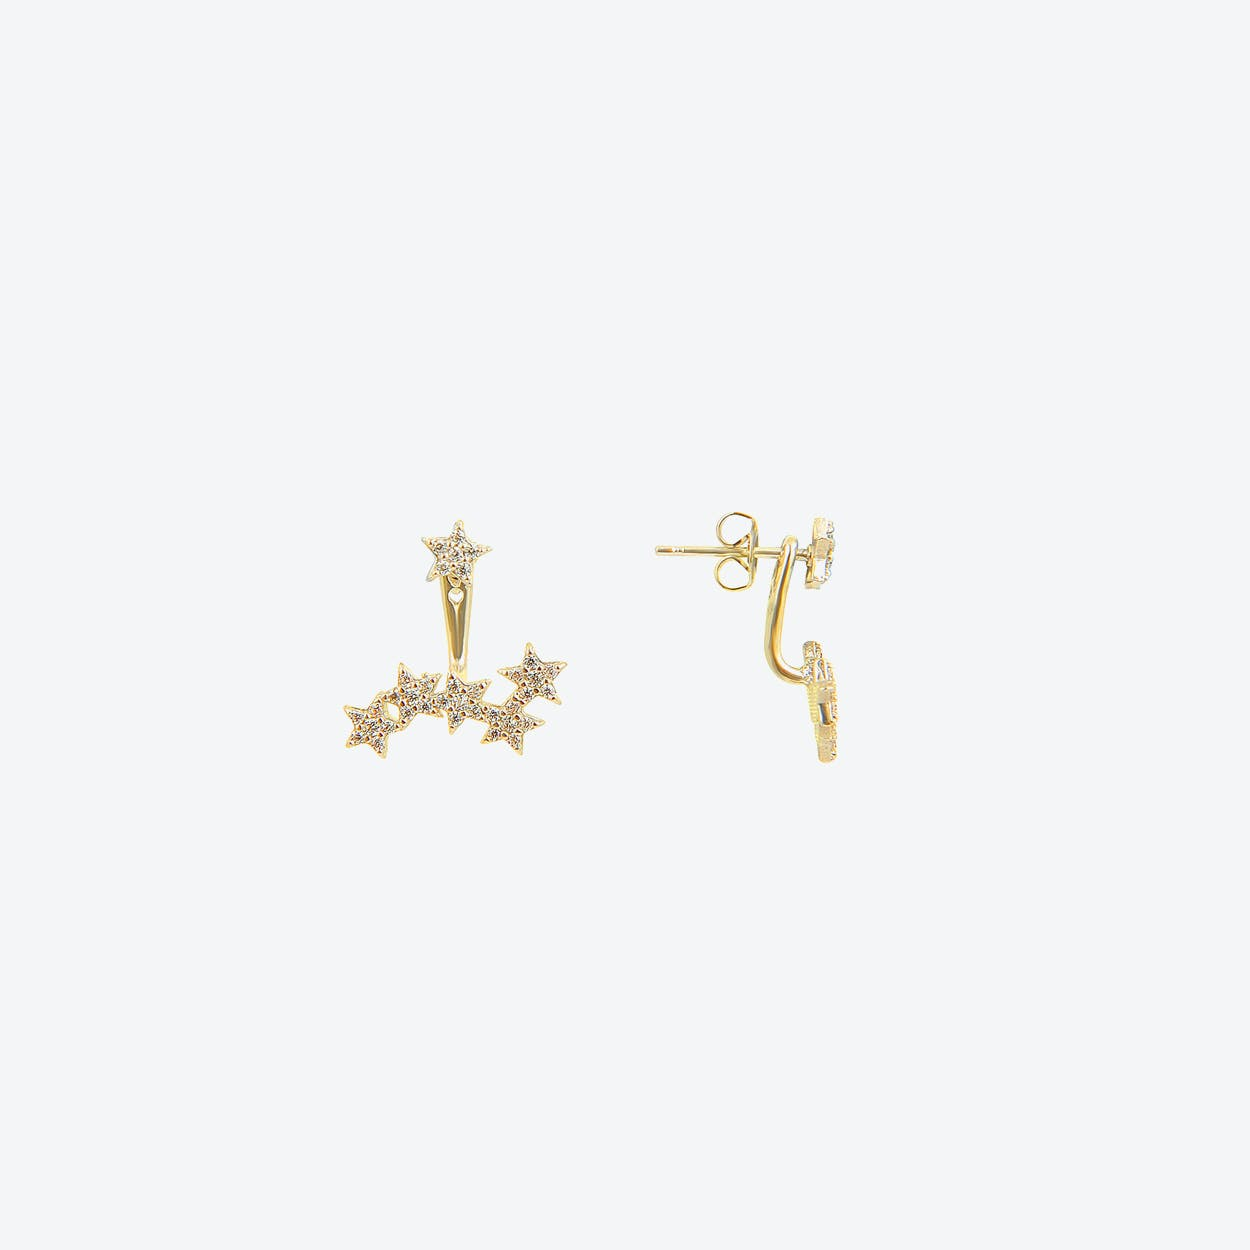 Starburst Two Way Earrings in Gold